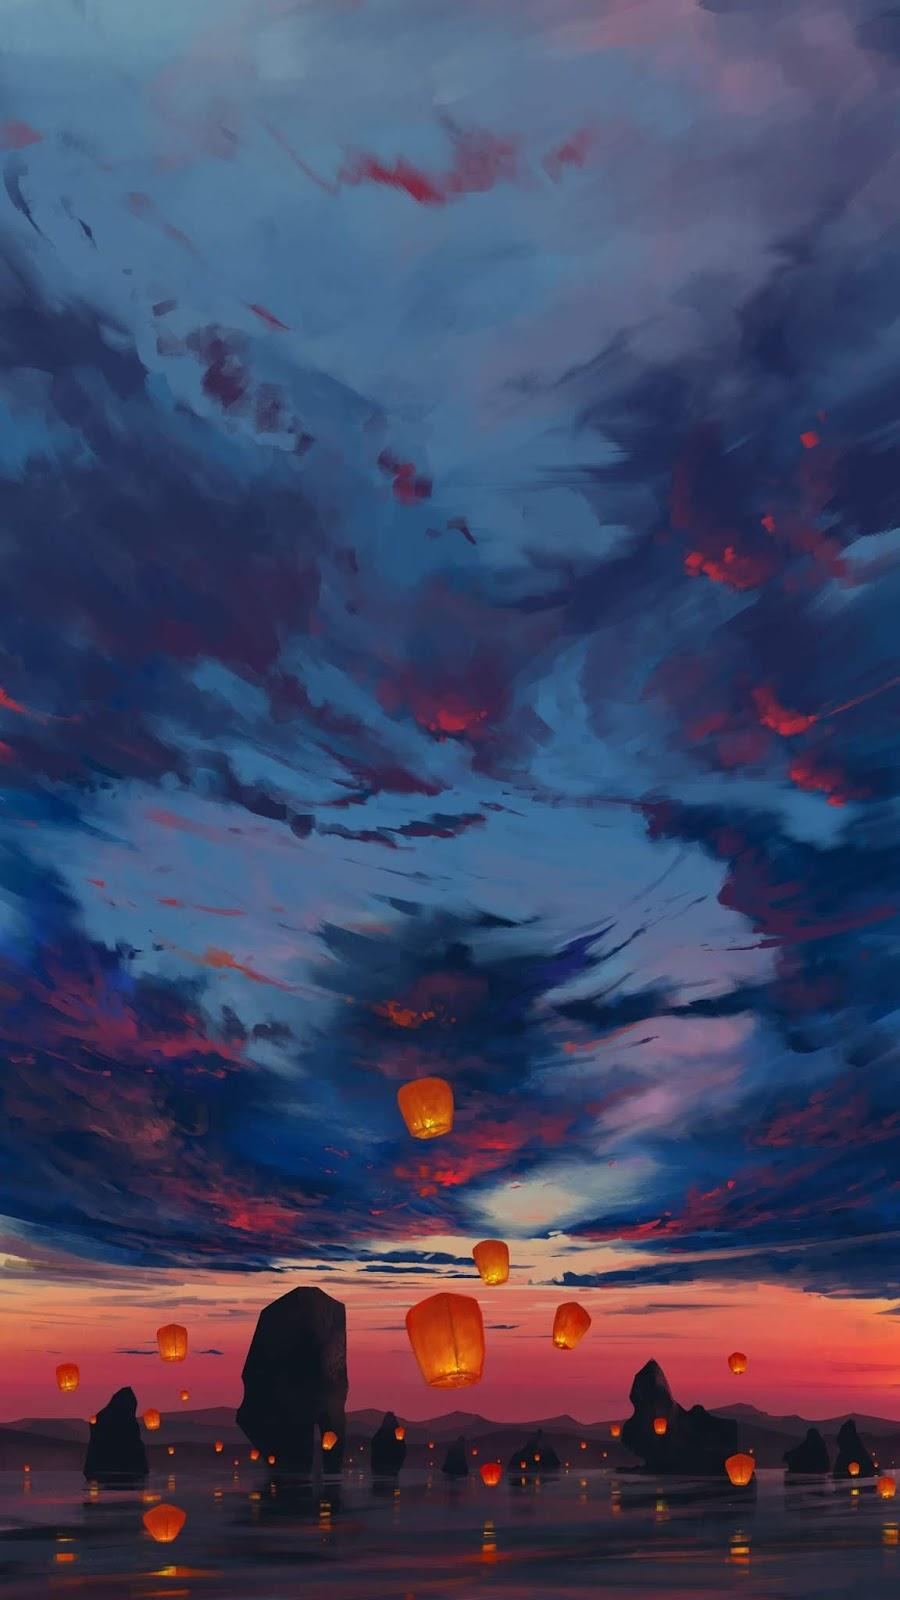 Lantern in the sunset wallpaper